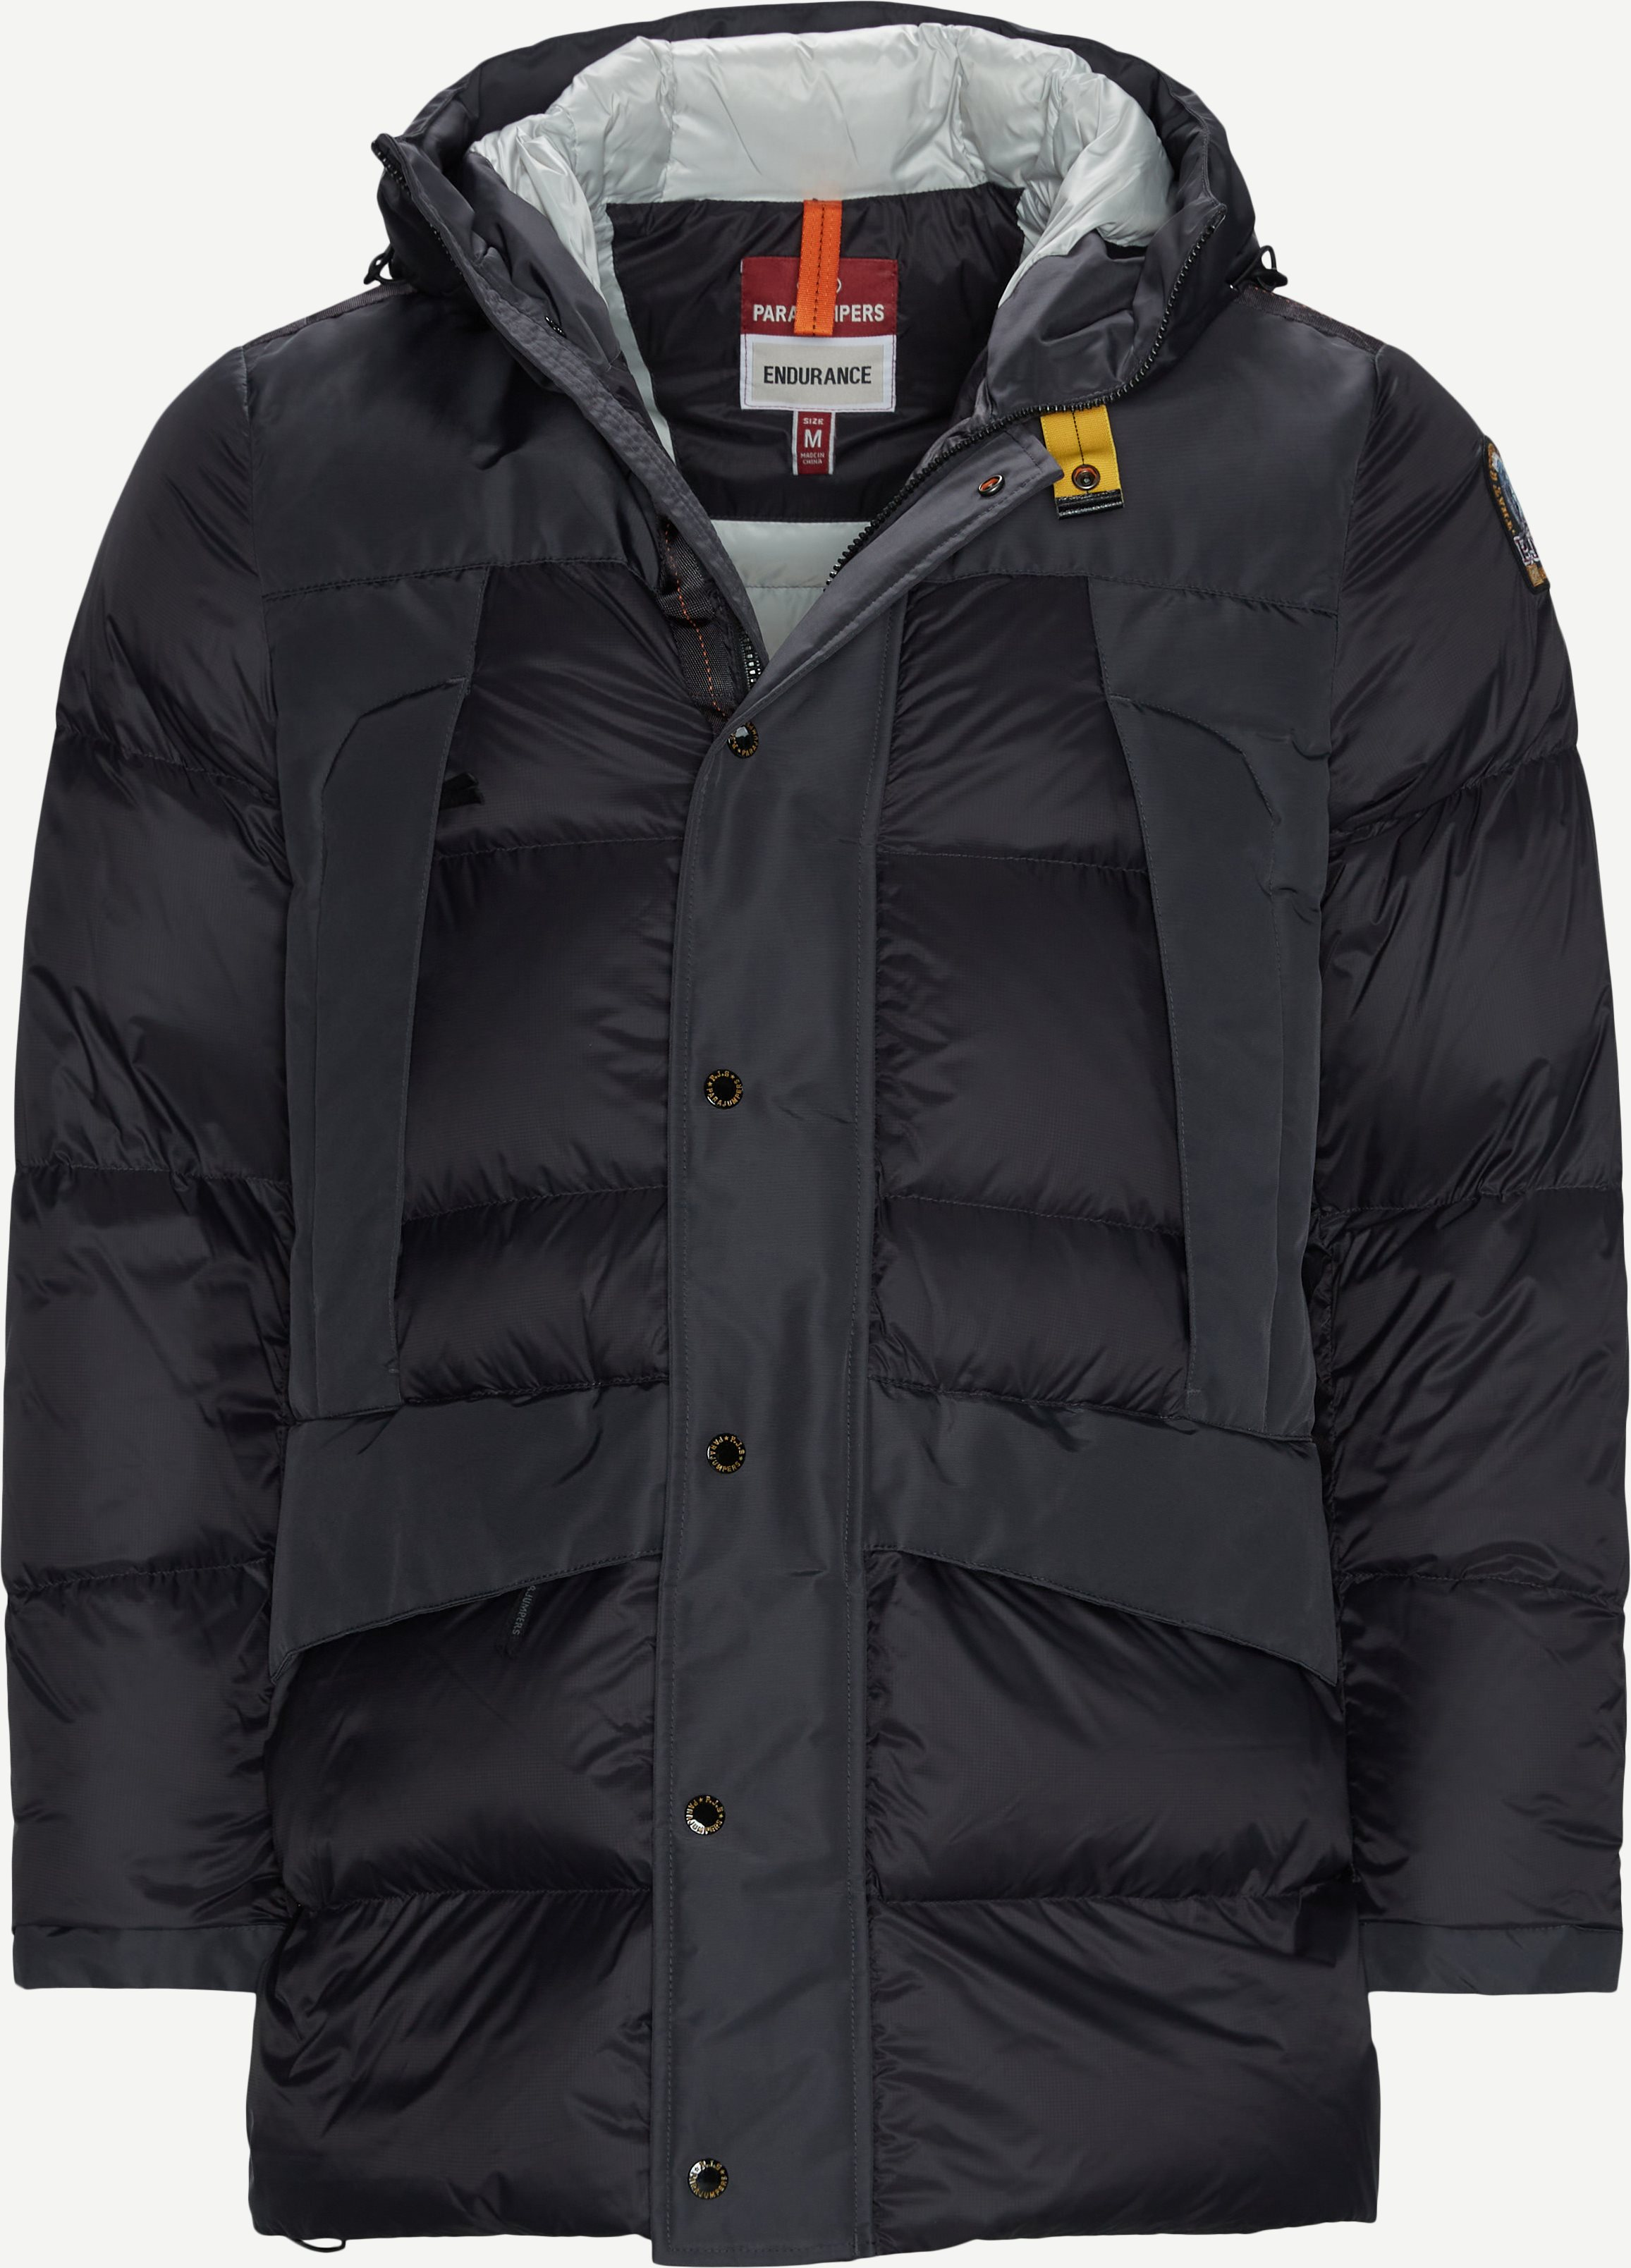 Shedir Down Jacket - Jakker - Regular fit - Sort